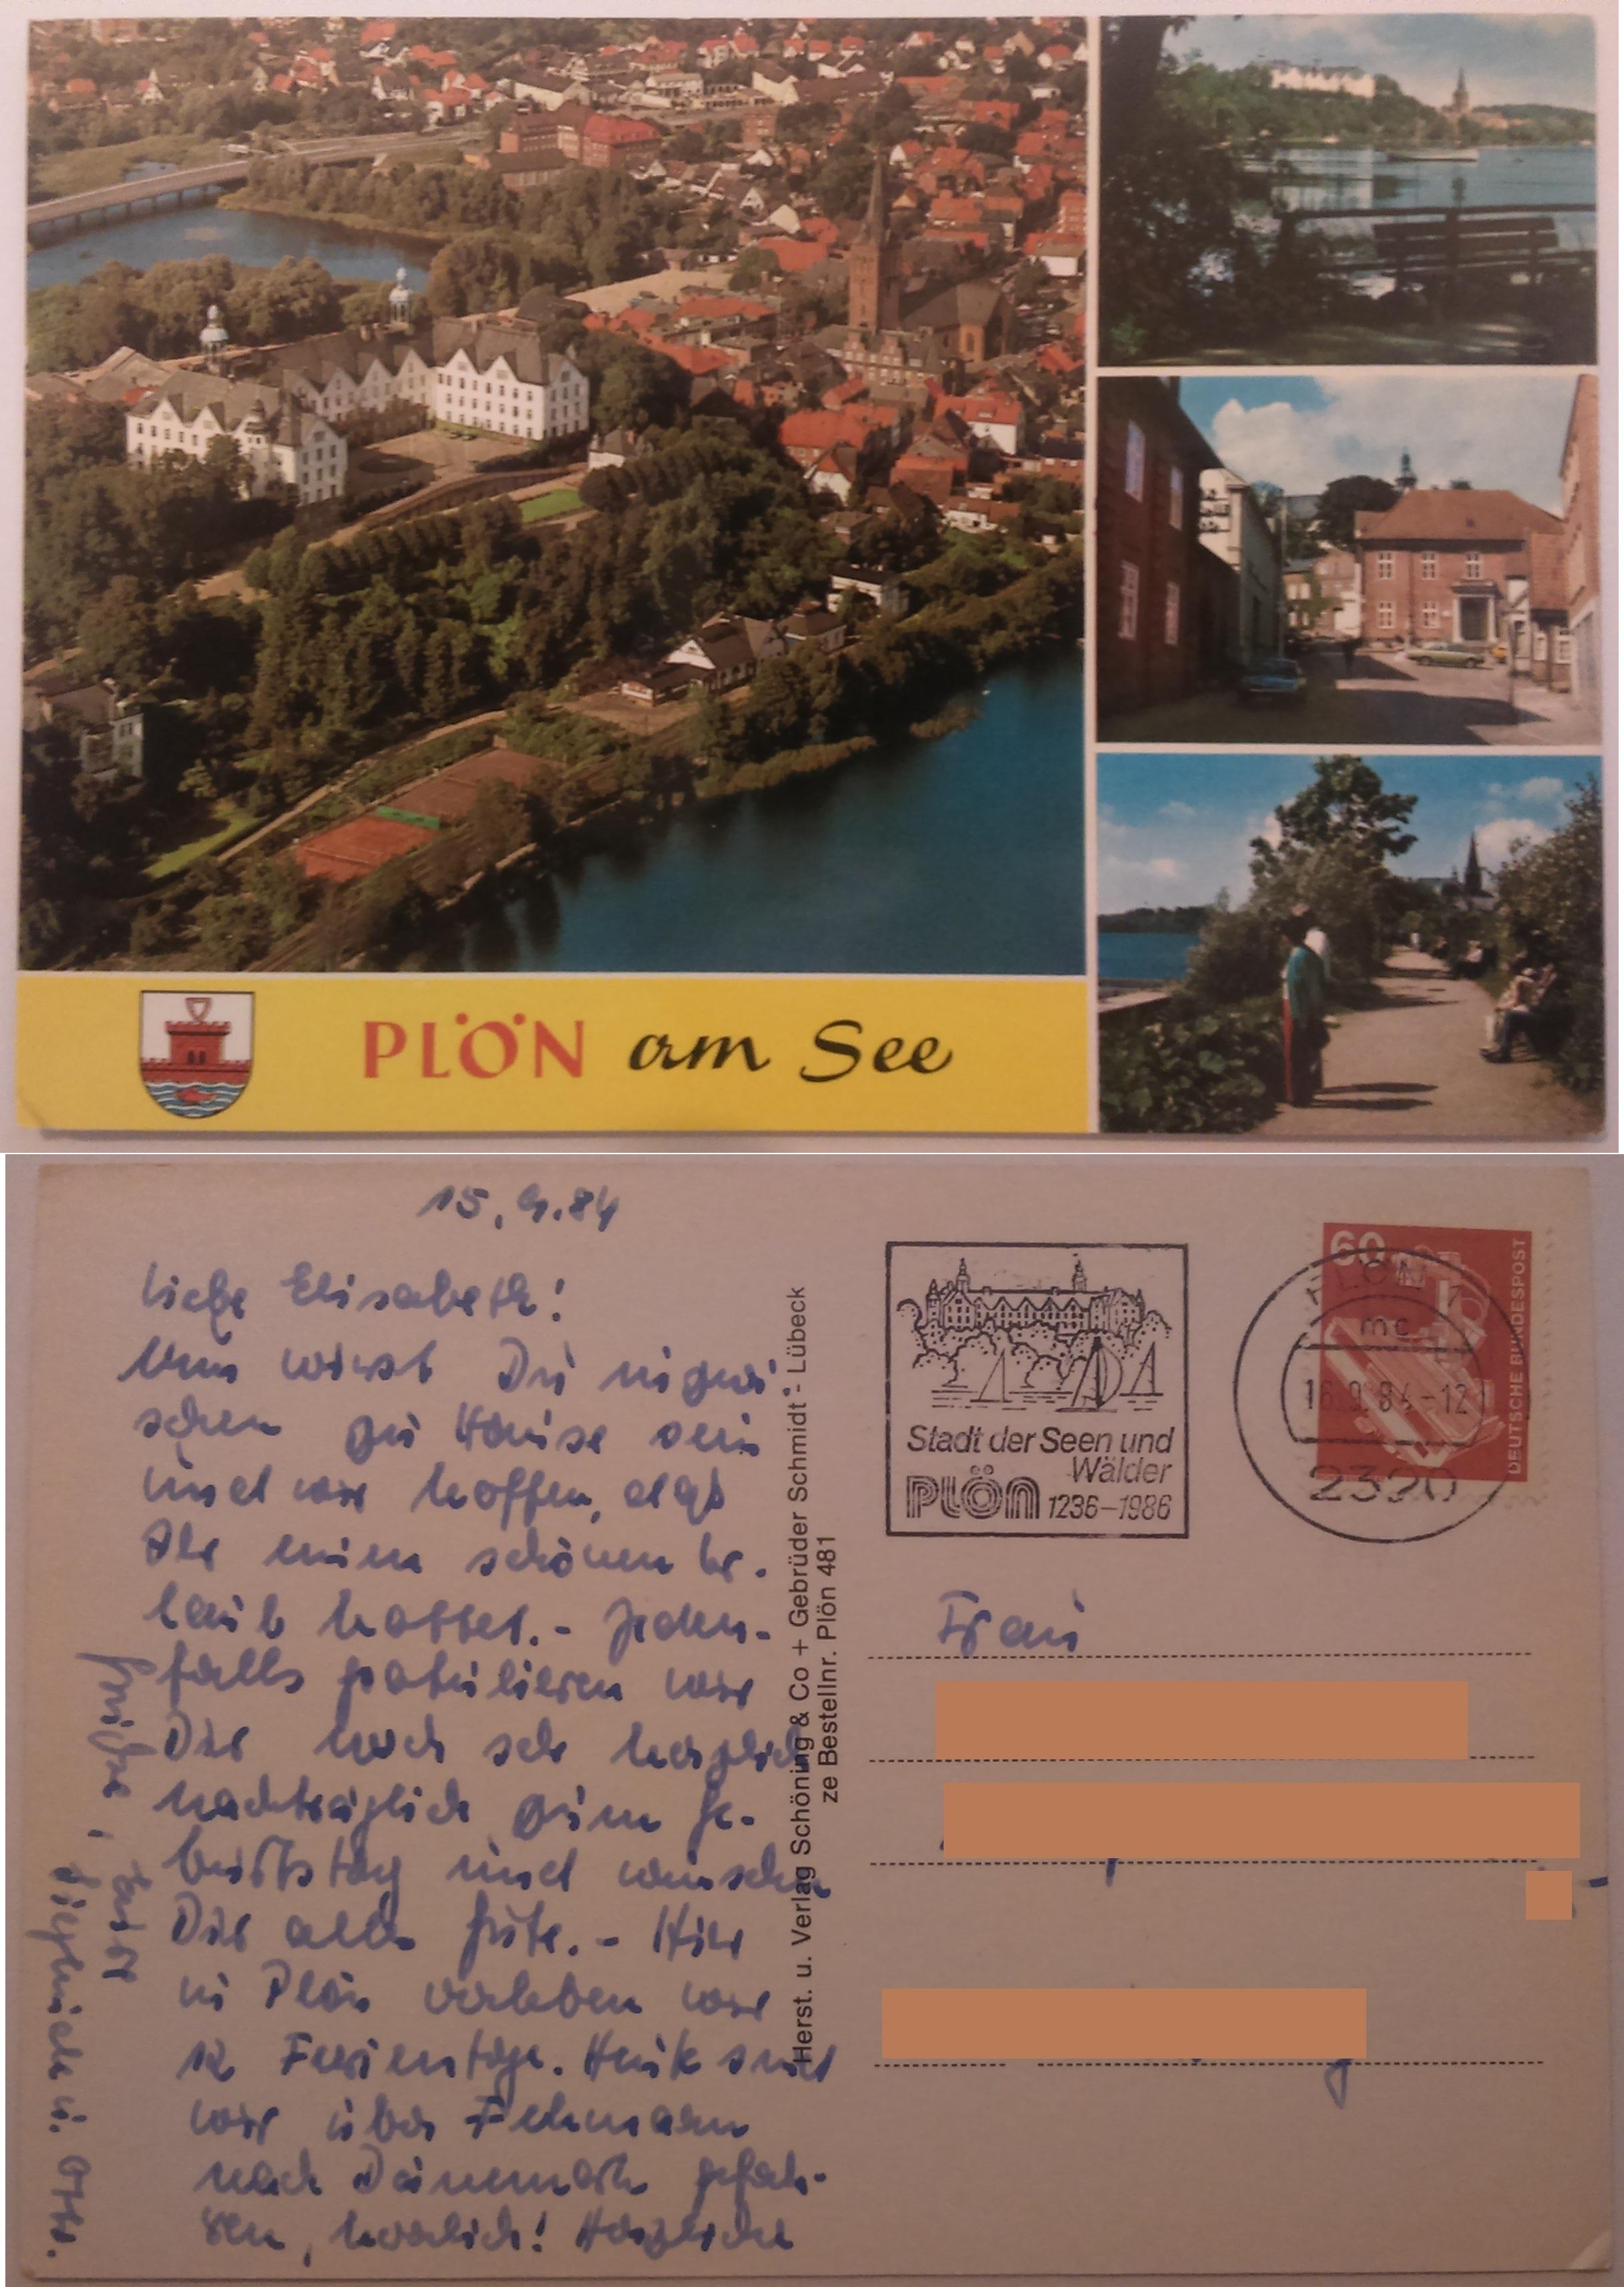 Plön am See (16.09.1984) both